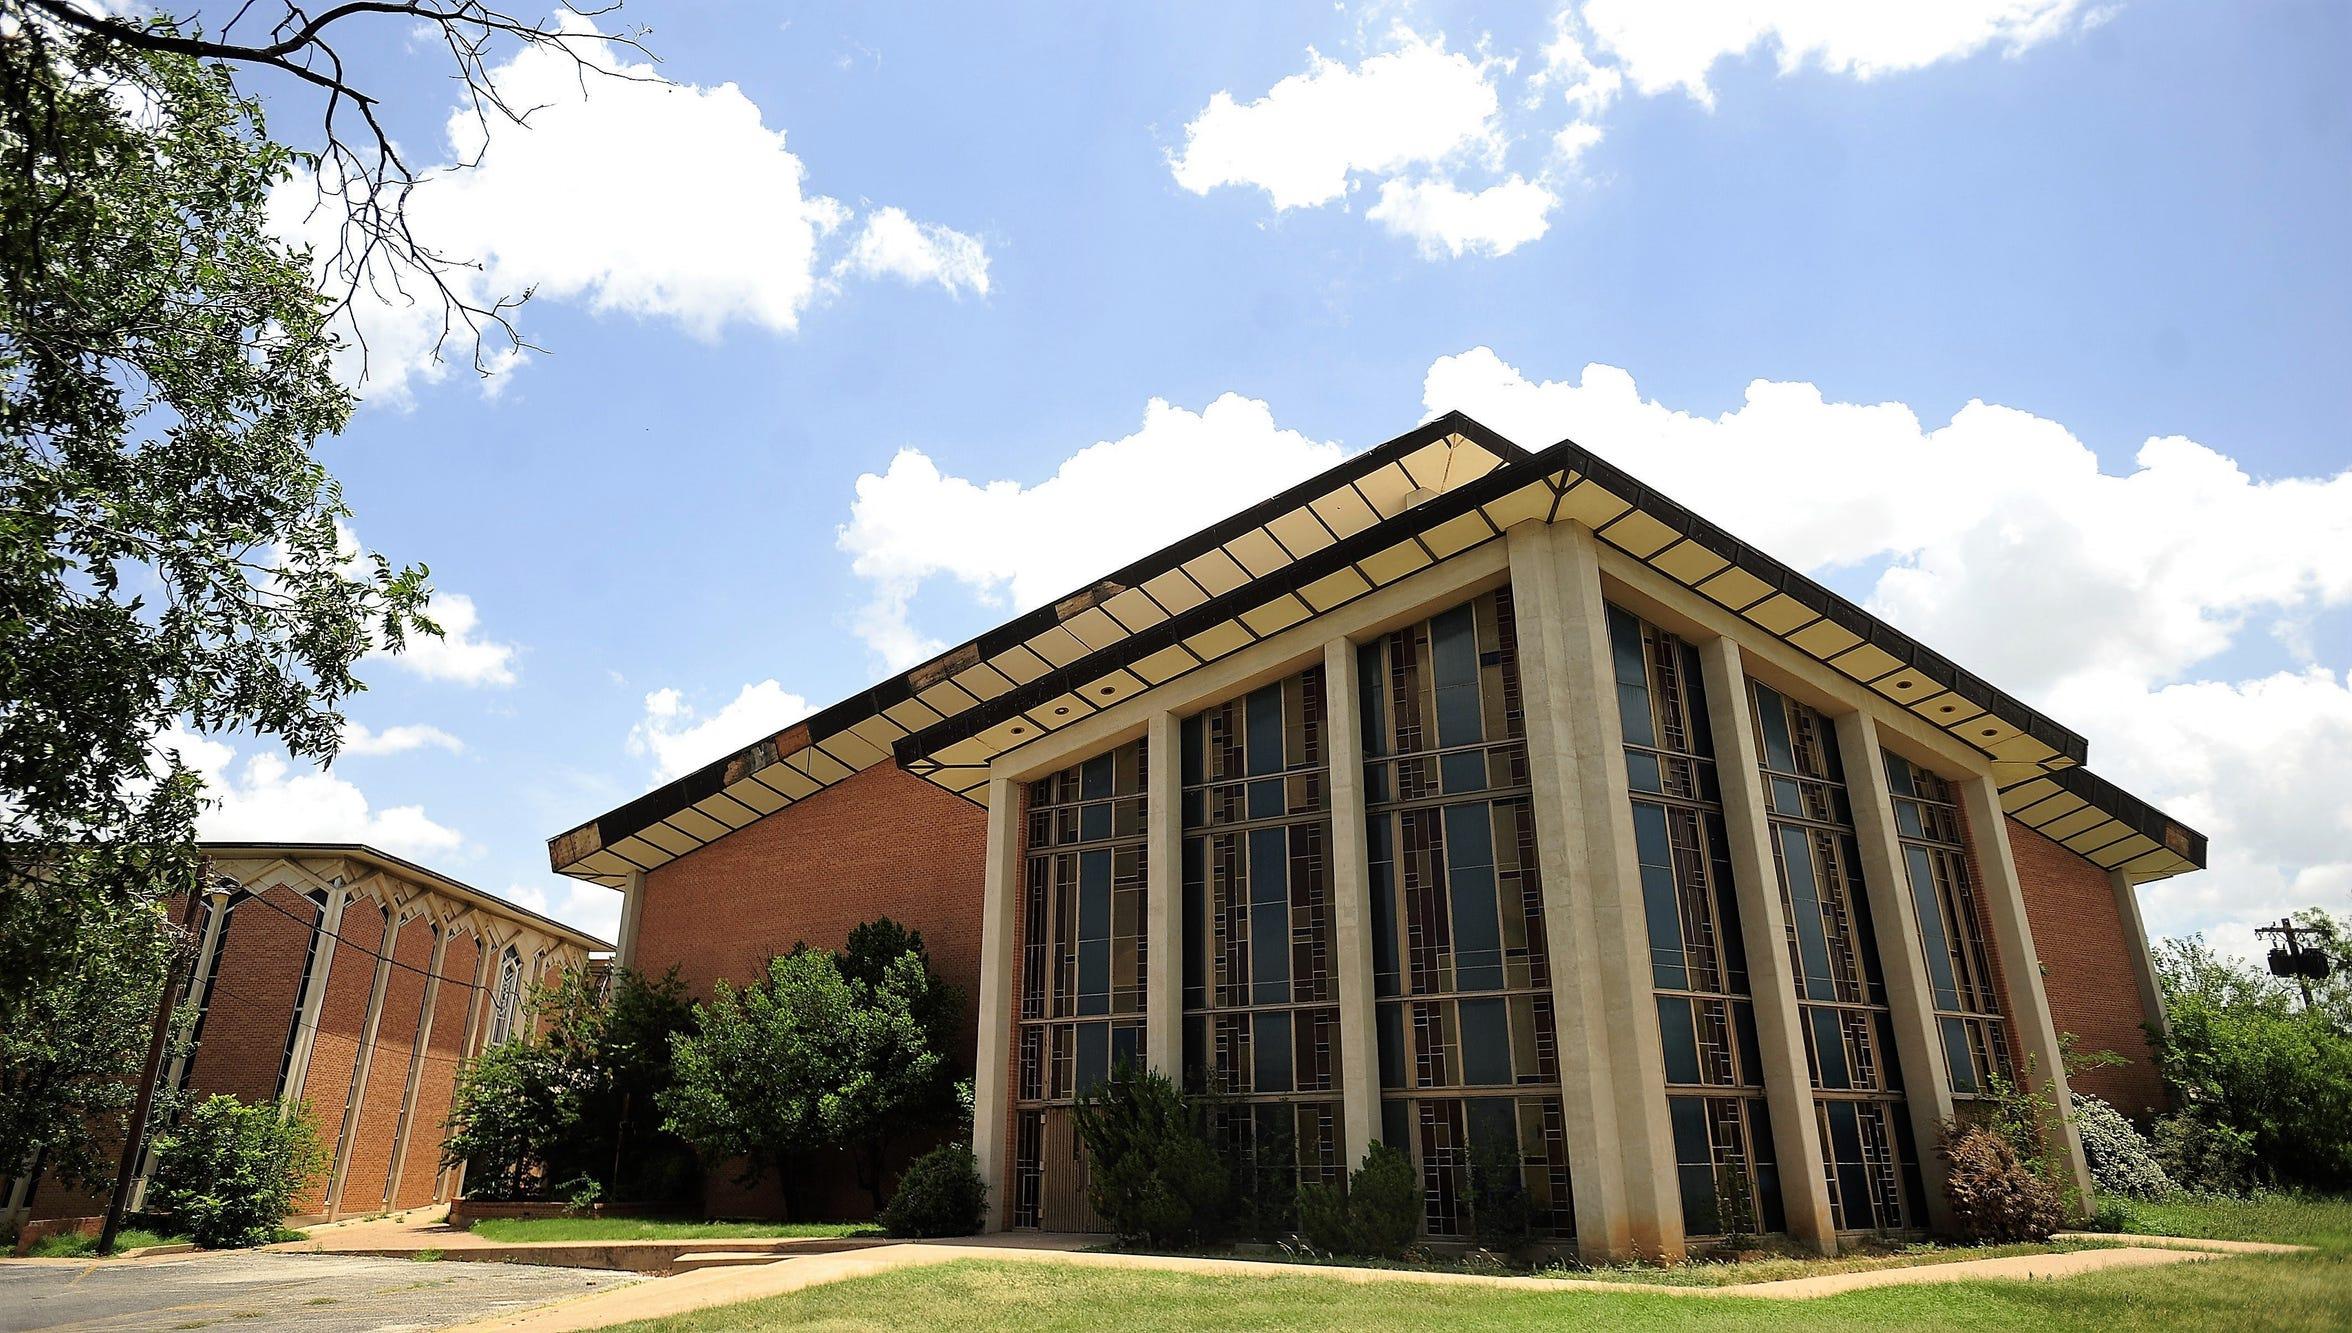 University Baptist Church before its demolition.